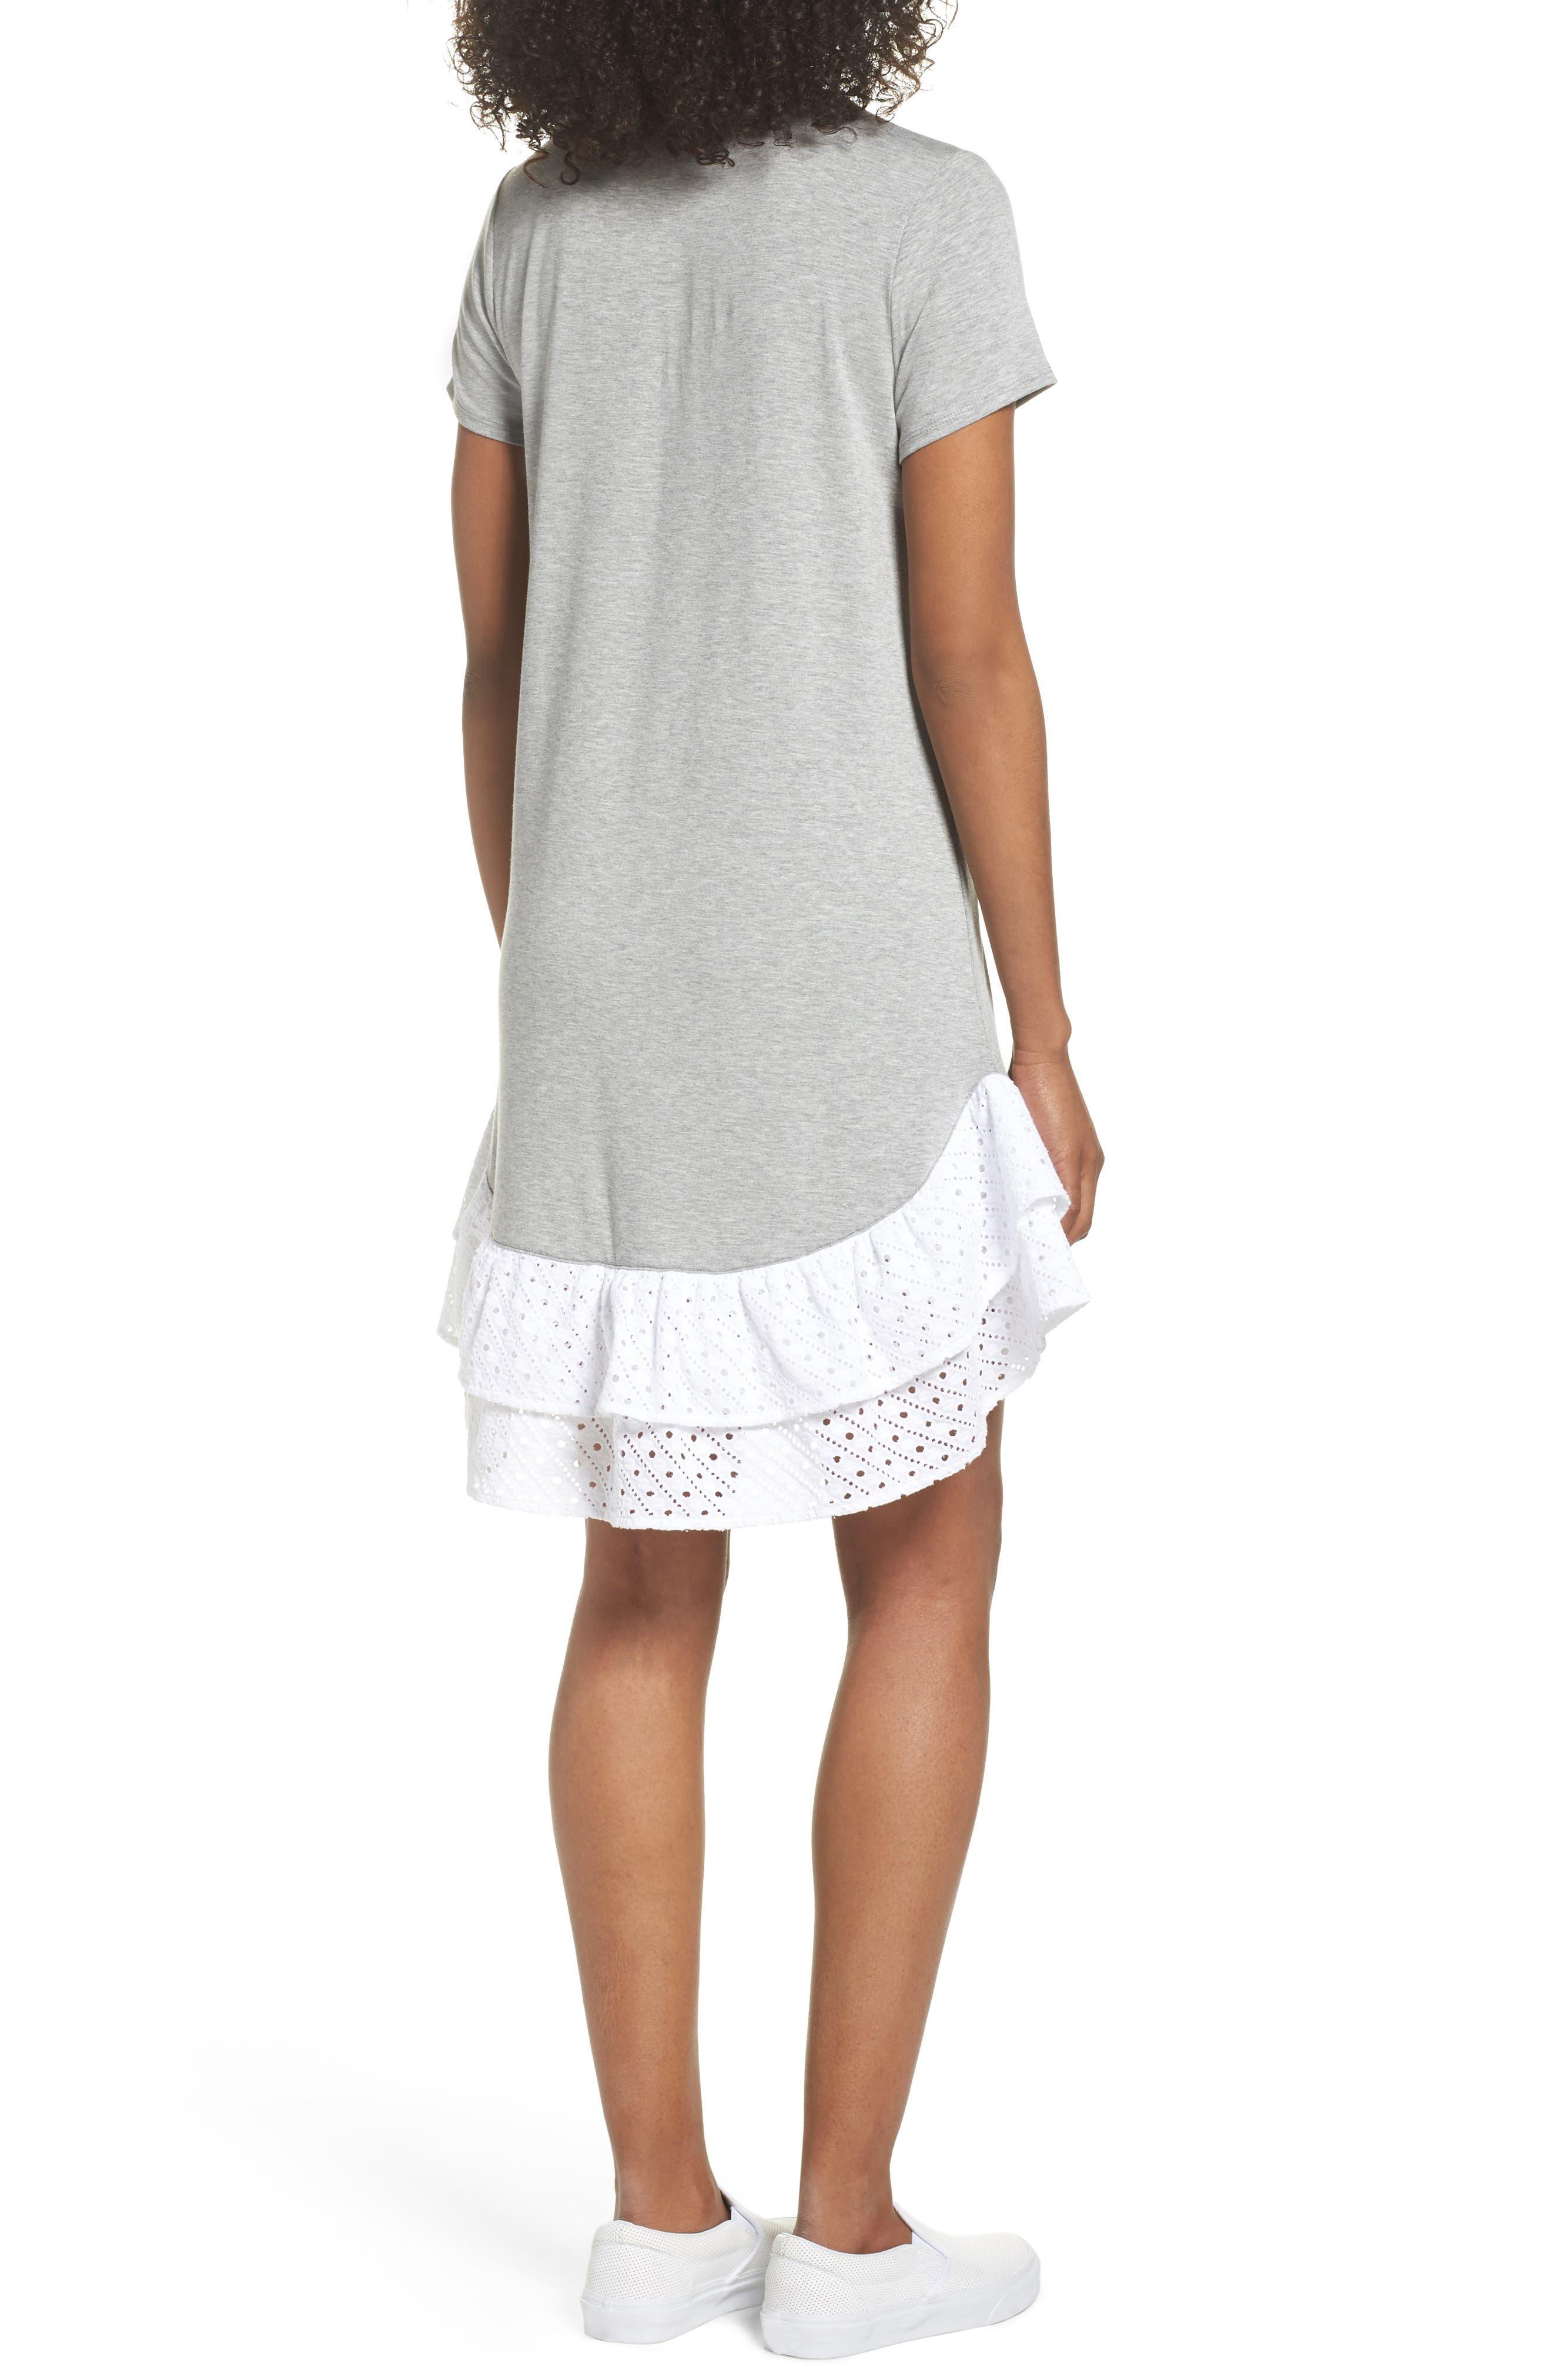 Alternate Image 2  - Chelsea28 Eyelet Trim T-Shirt Dress